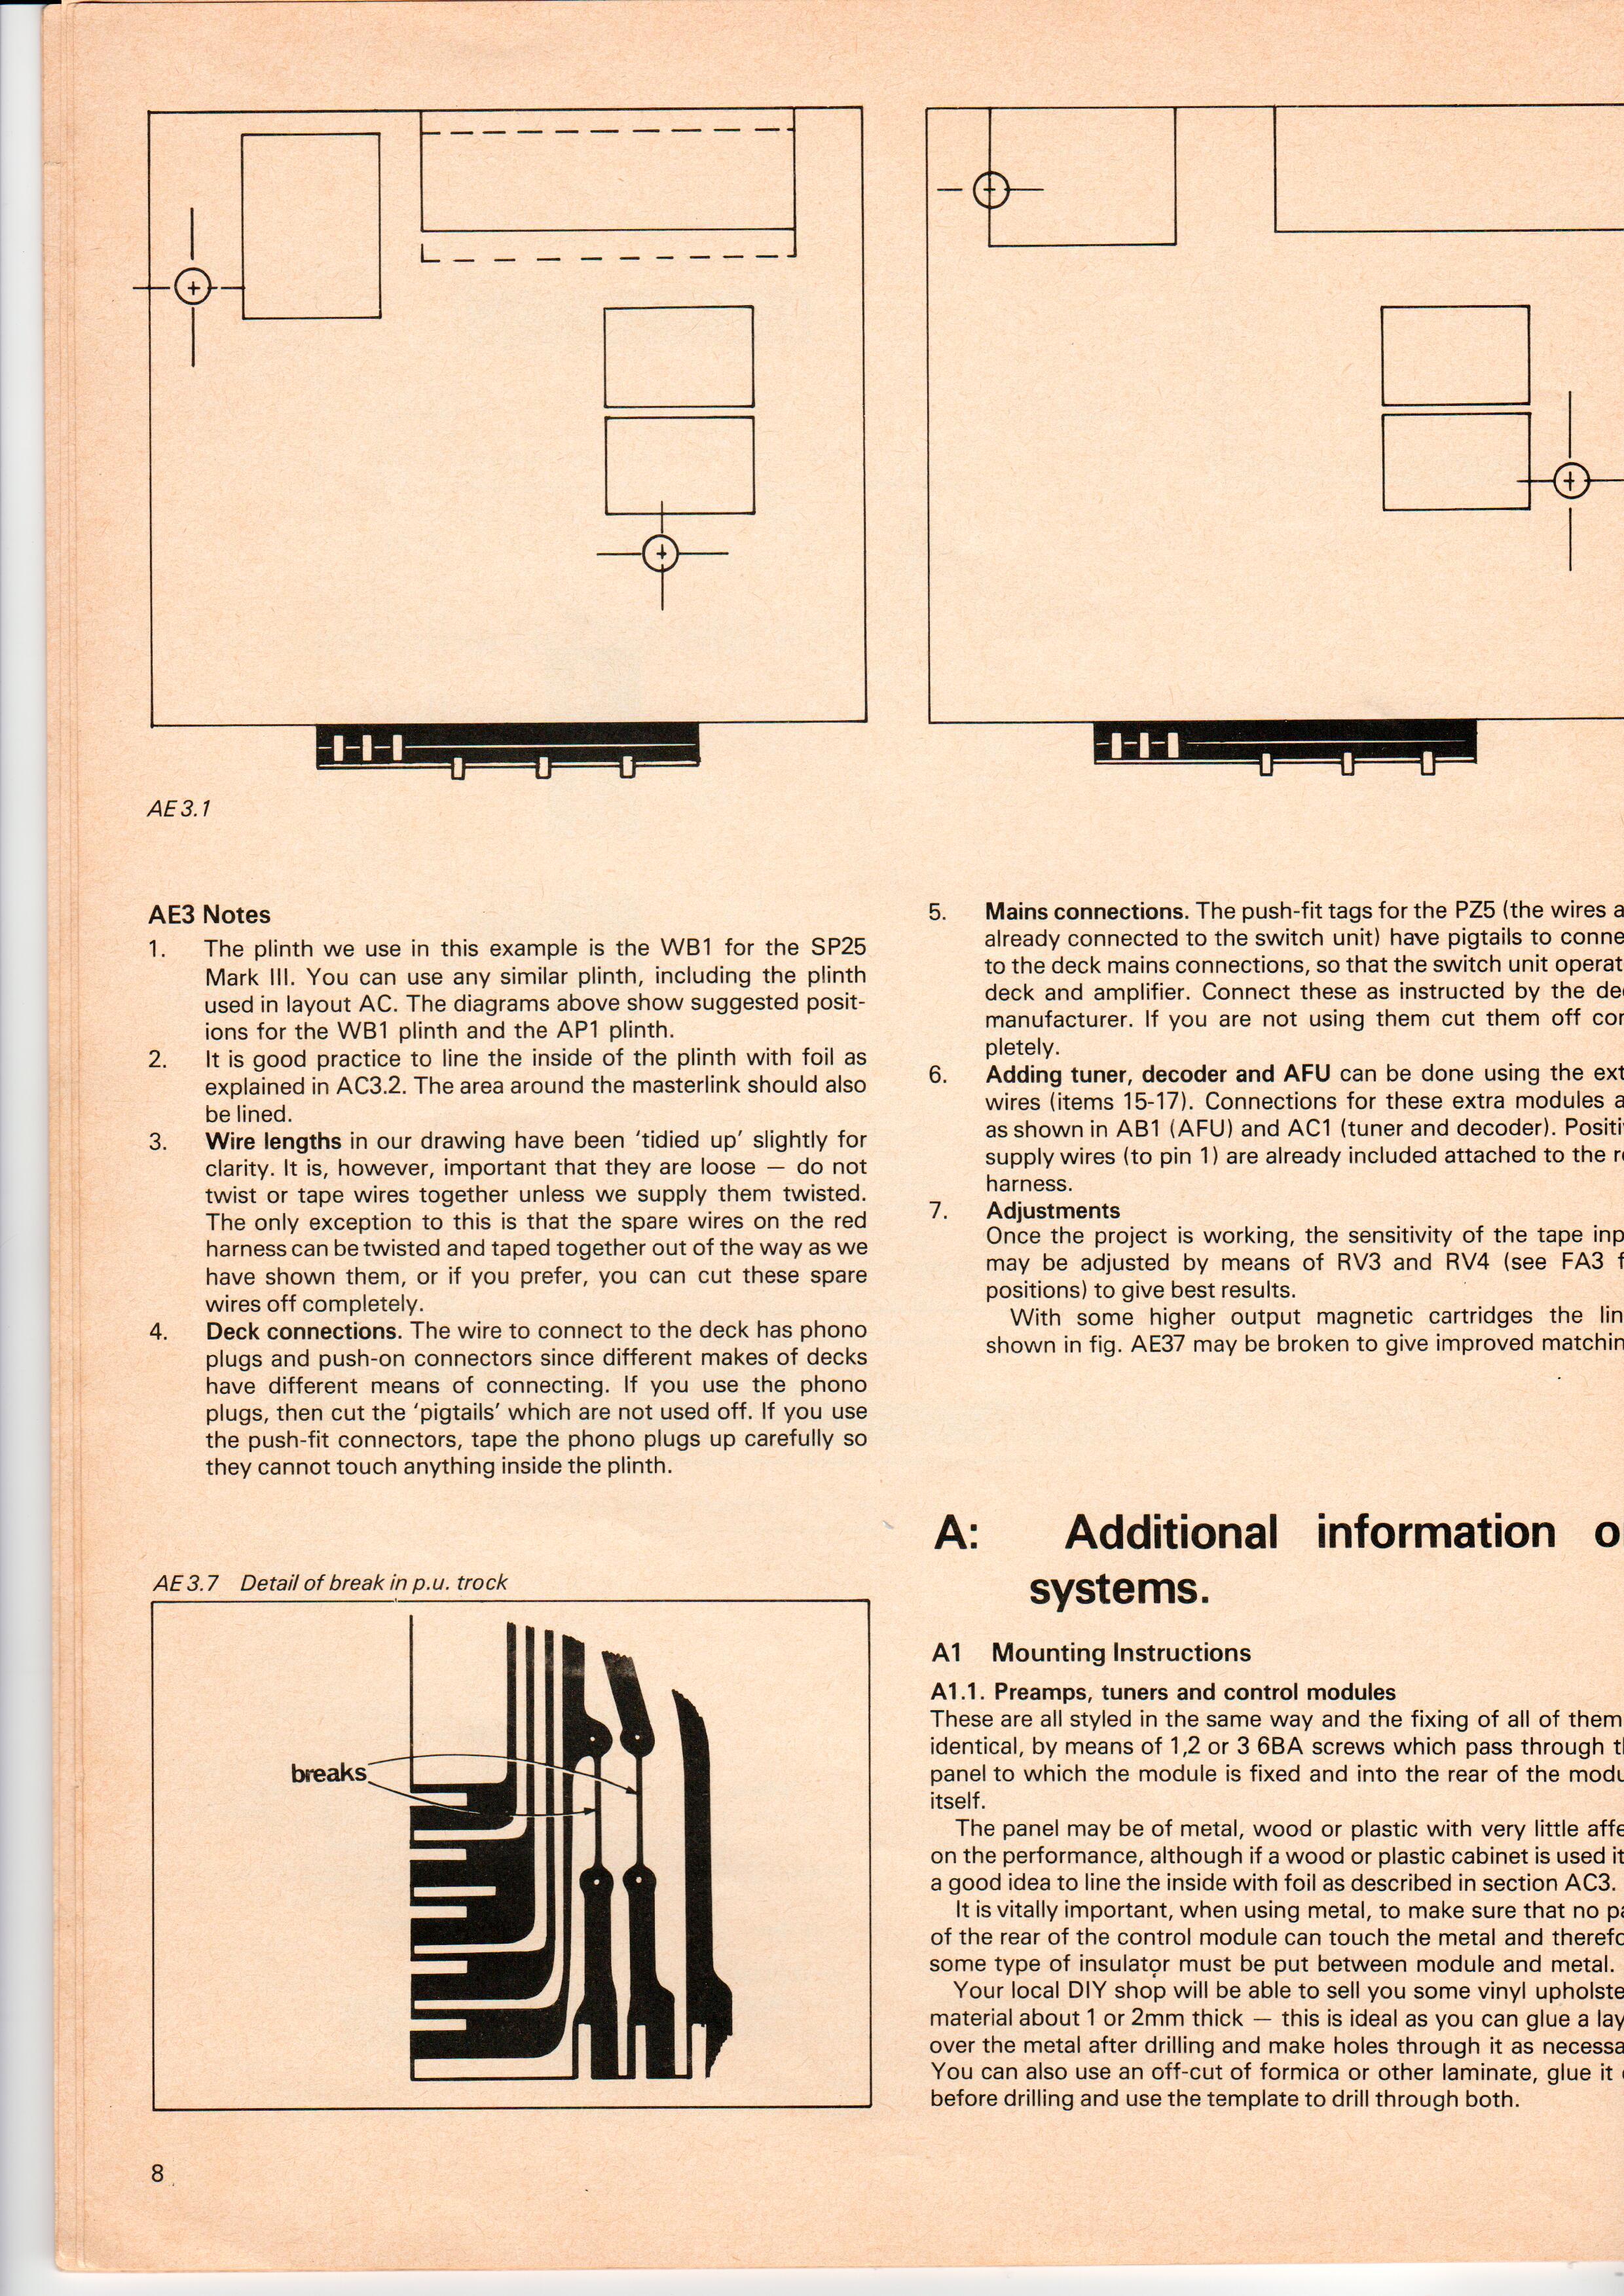 Sinclair Radionics Project 80 Manual: Contents. on bob beck schematics, machine schematics, simple radio schematics, pink noise generator schematics, hidden blade schematics, circuit board schematics, magnetic generator schematics, ufo schematics,